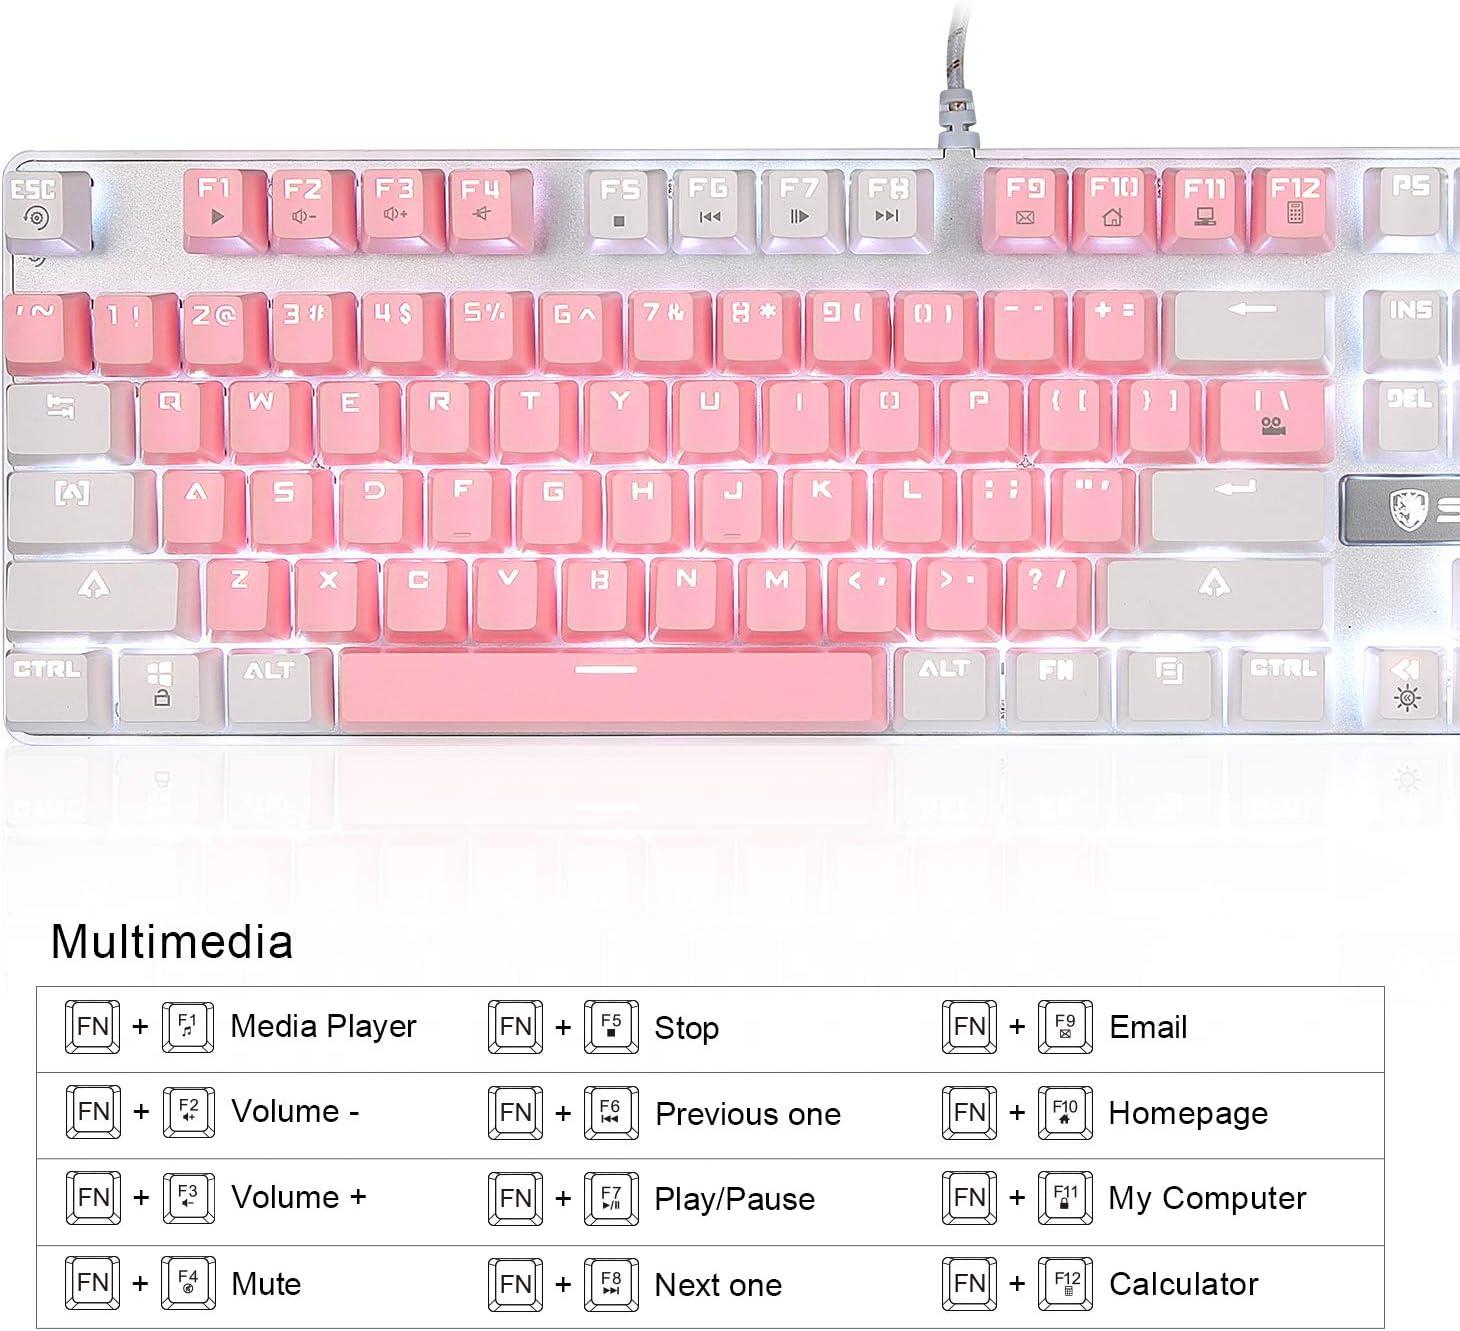 Pink White Mechanical Gaming Keyboard,SADES Blue Switches 104 Keys Mechanical Gaming Keyboard,Wired USB White LED Backlit Cute Computer Keyboard,Pink Mechanical Gaming Keyboard for PC//Mac//Laptop